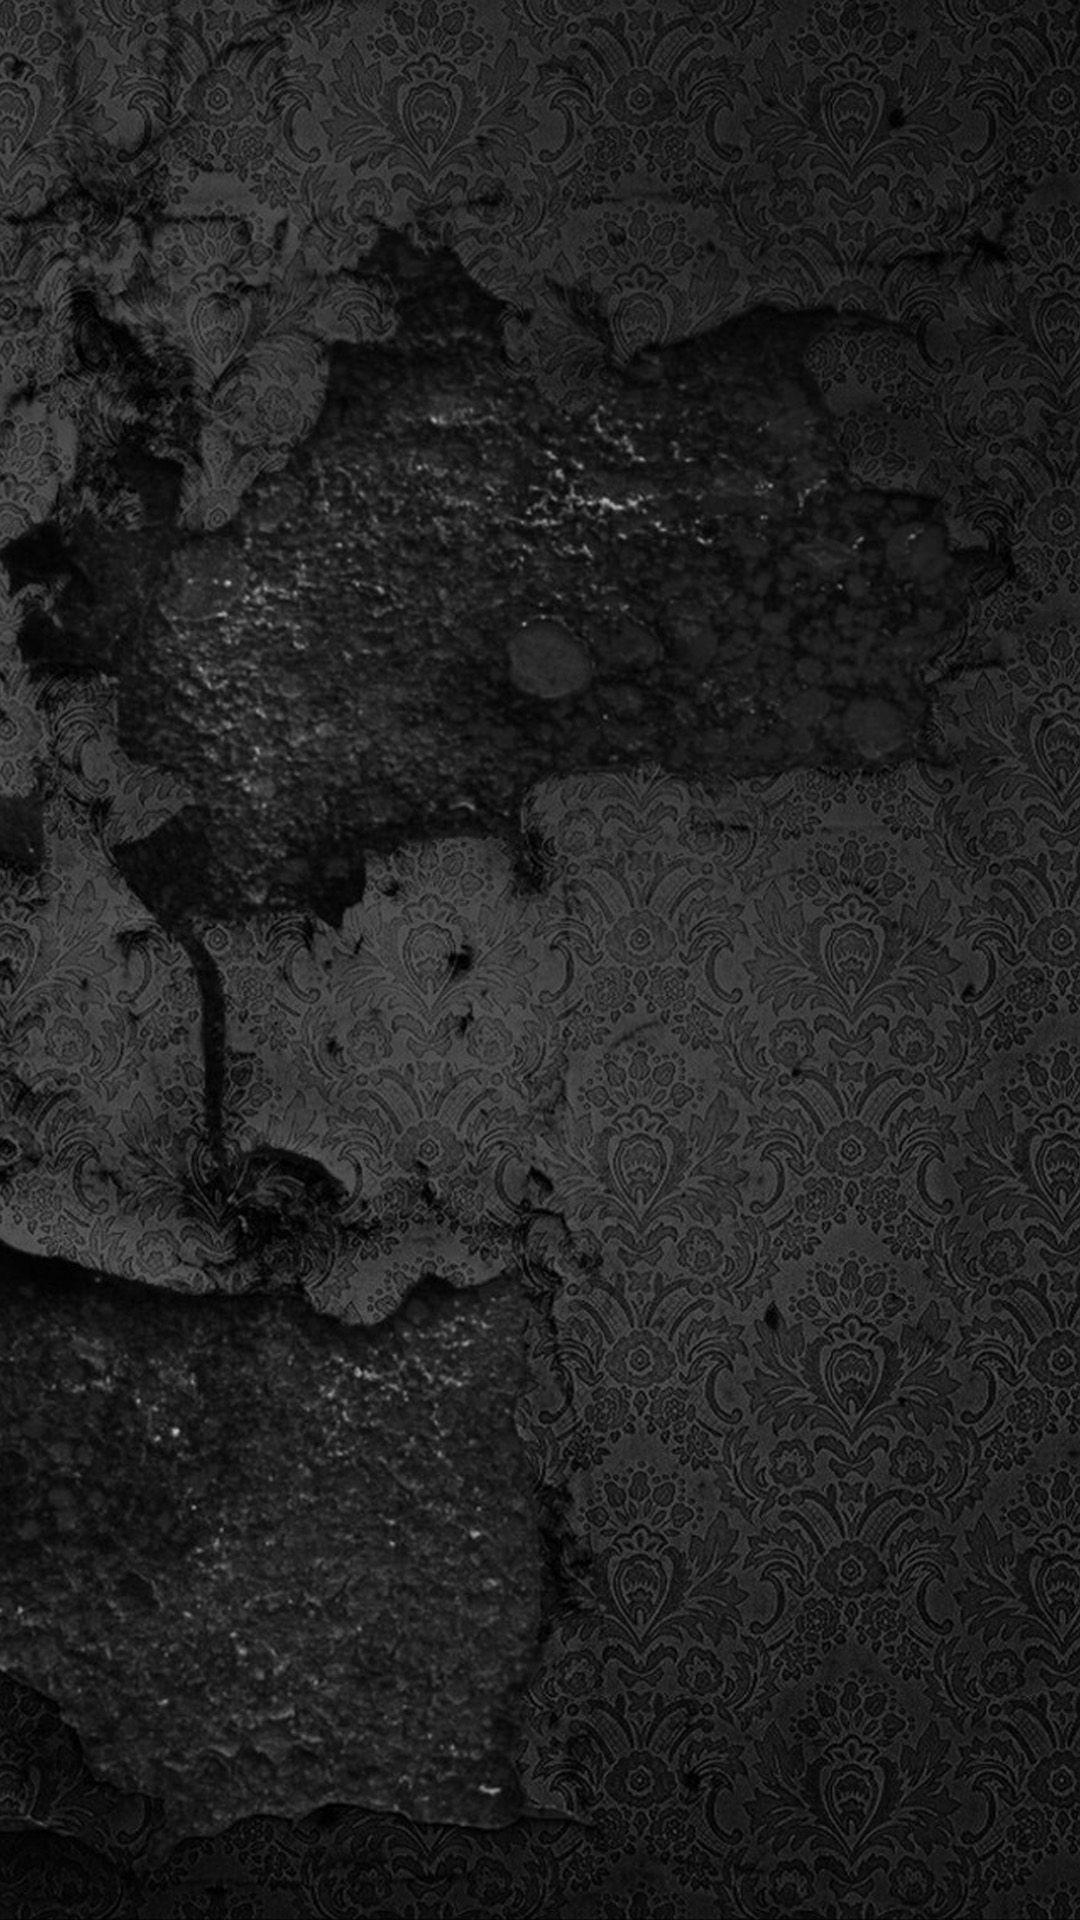 … carbon fiber iphone 6 plus wallpapers – Black Lg G2 Wallpapers Lg.  Download